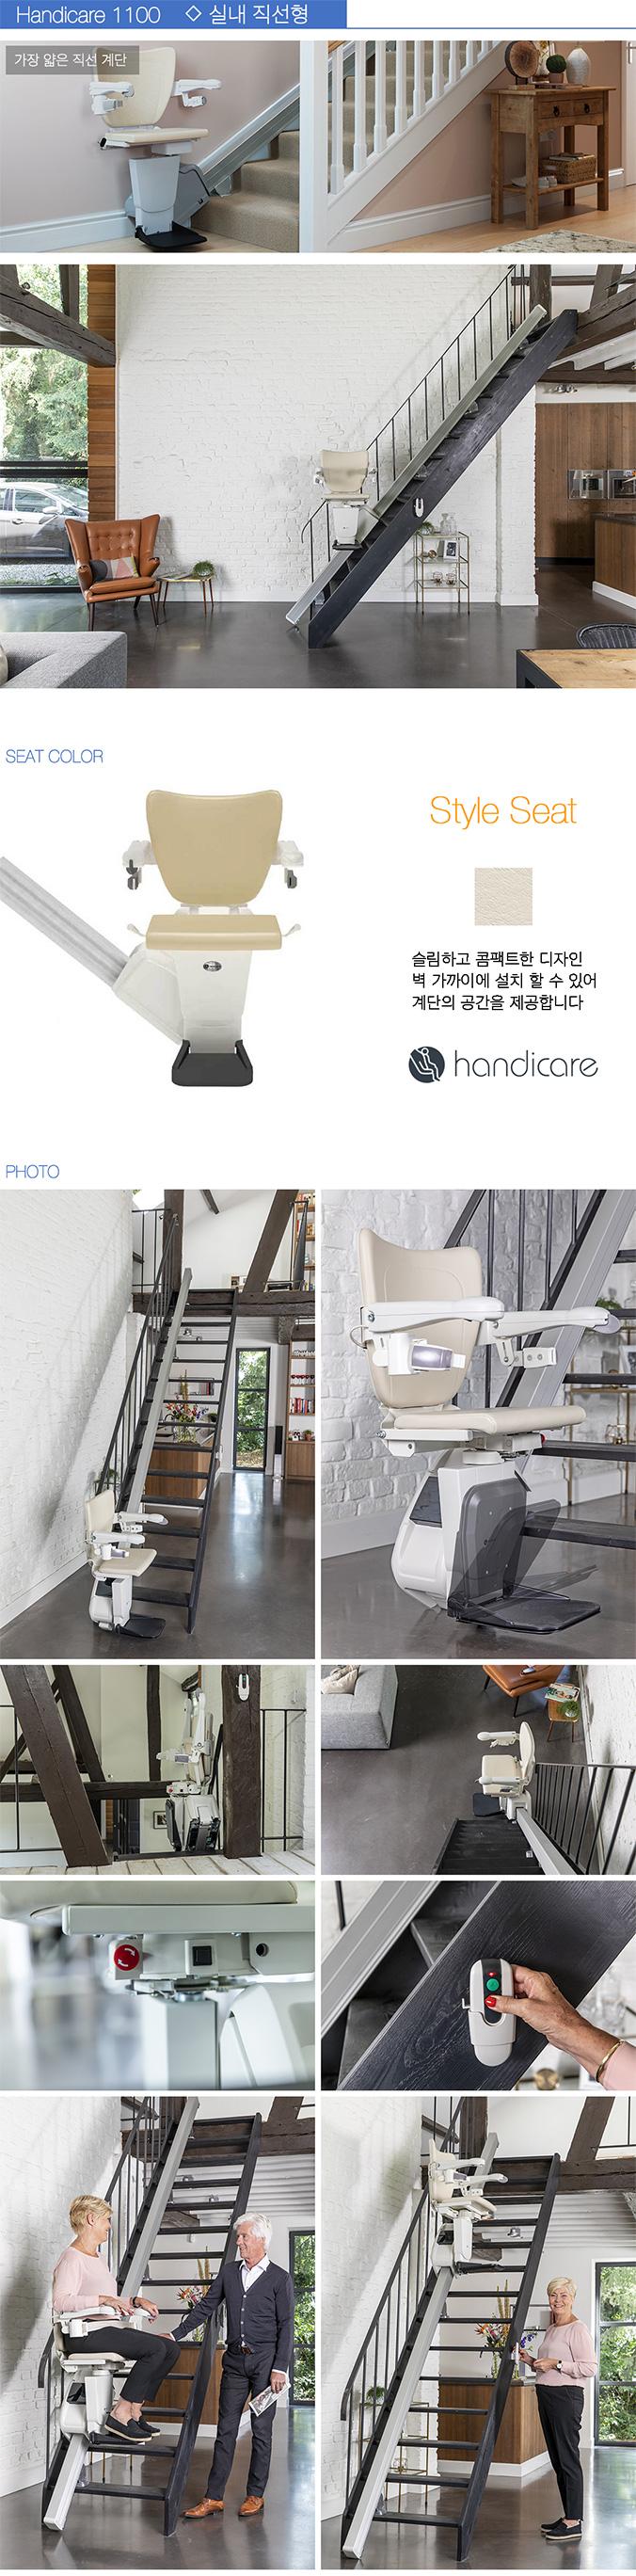 products_Handicare1100_w676.jpg